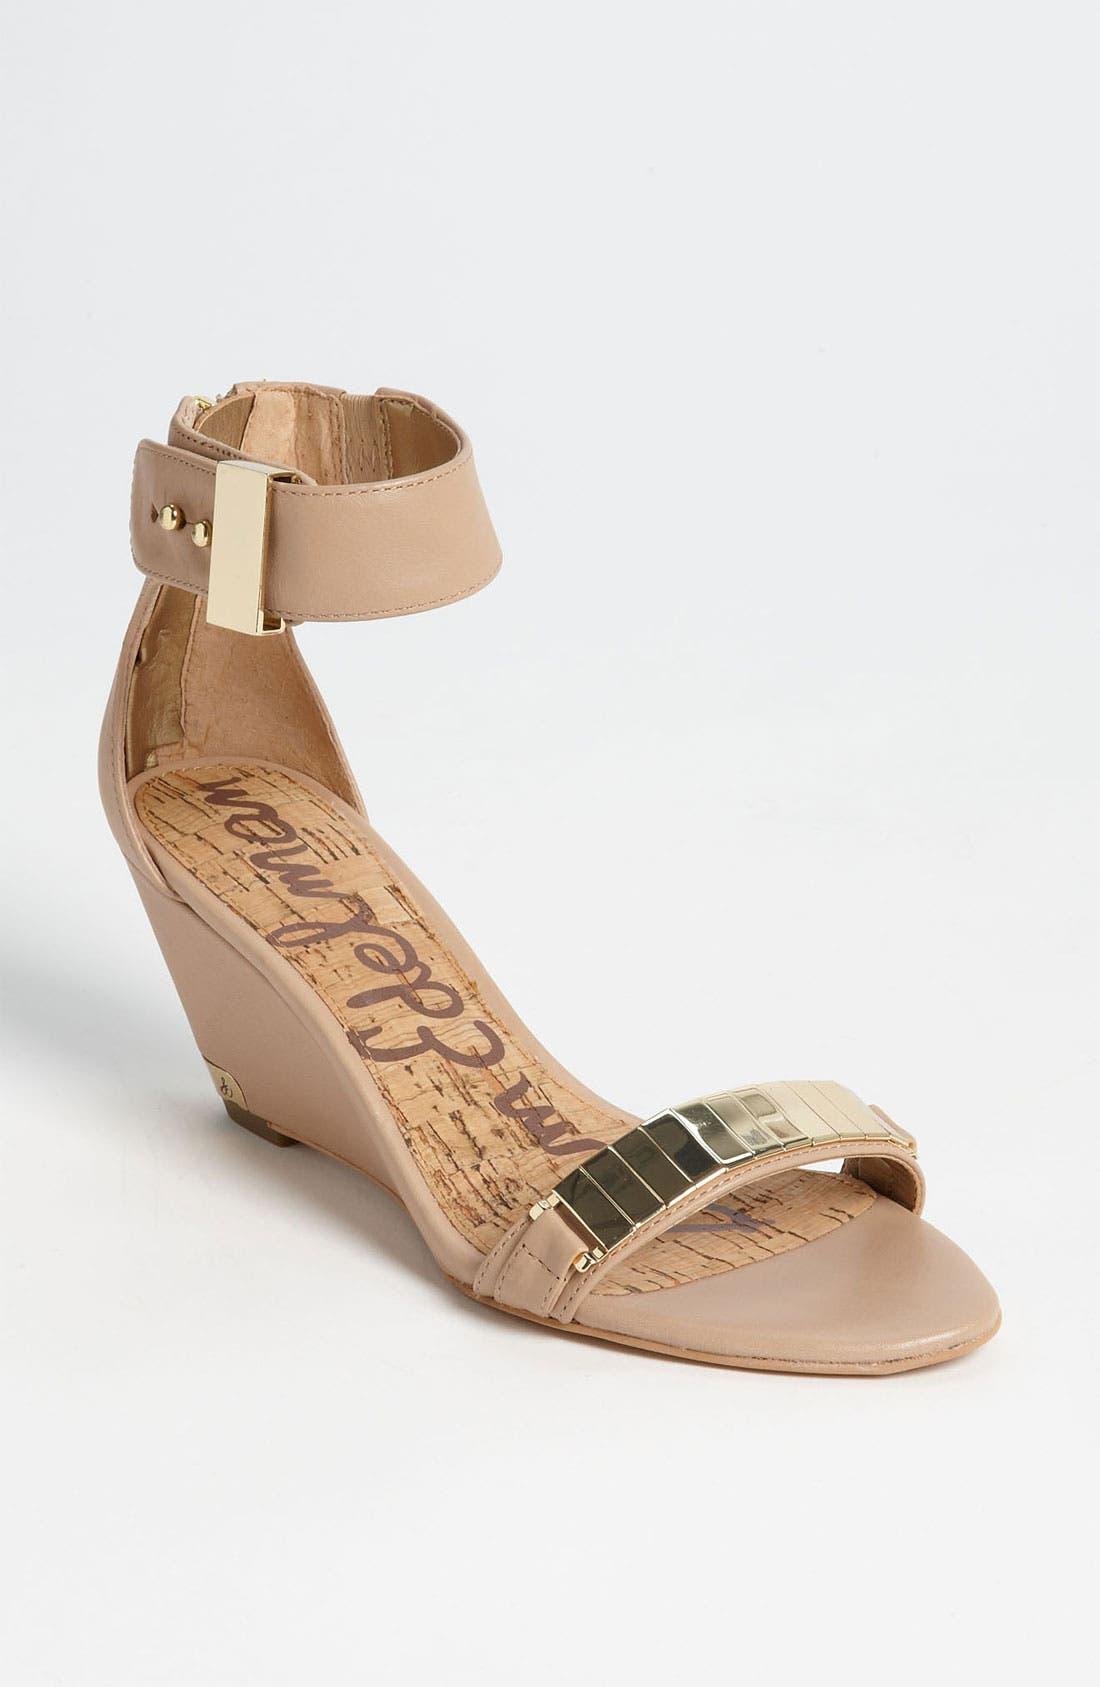 Alternate Image 1 Selected - Sam Edelman 'Serena' Sandal